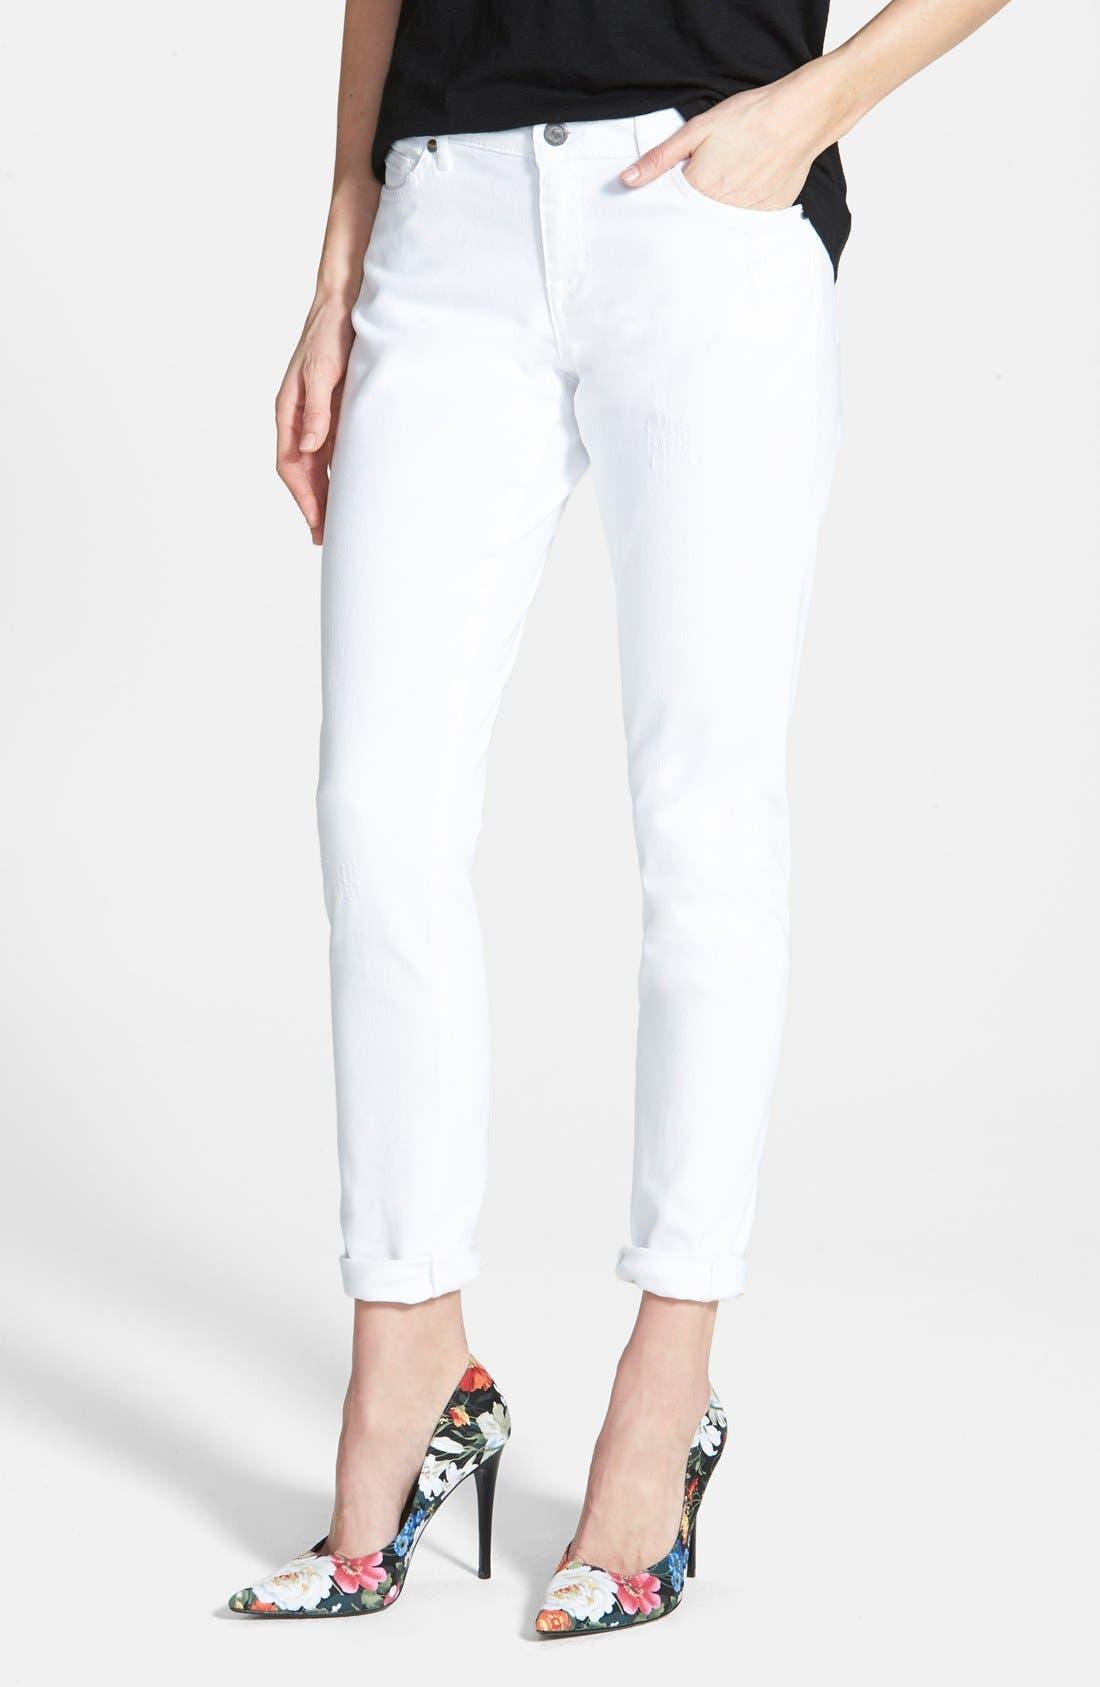 Main Image - CJ by Cookie Johnson 'Glory' Slim Boyfriend Jeans (Optic White)